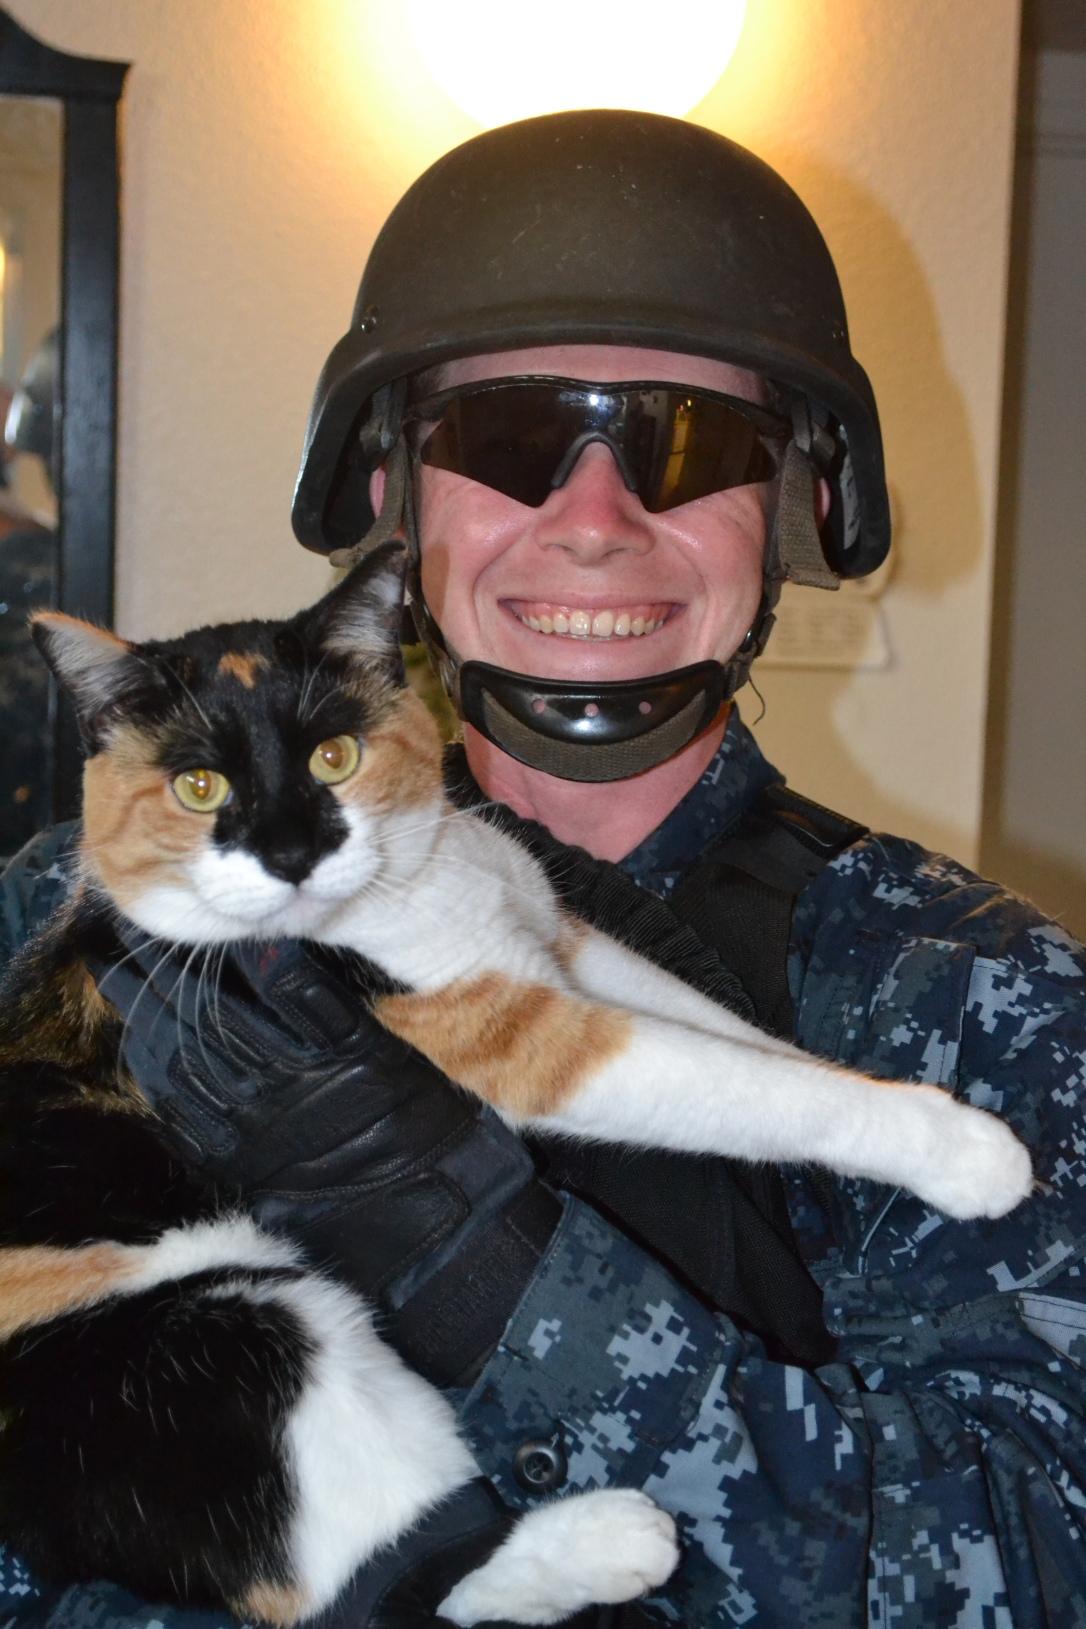 Combat kitty?